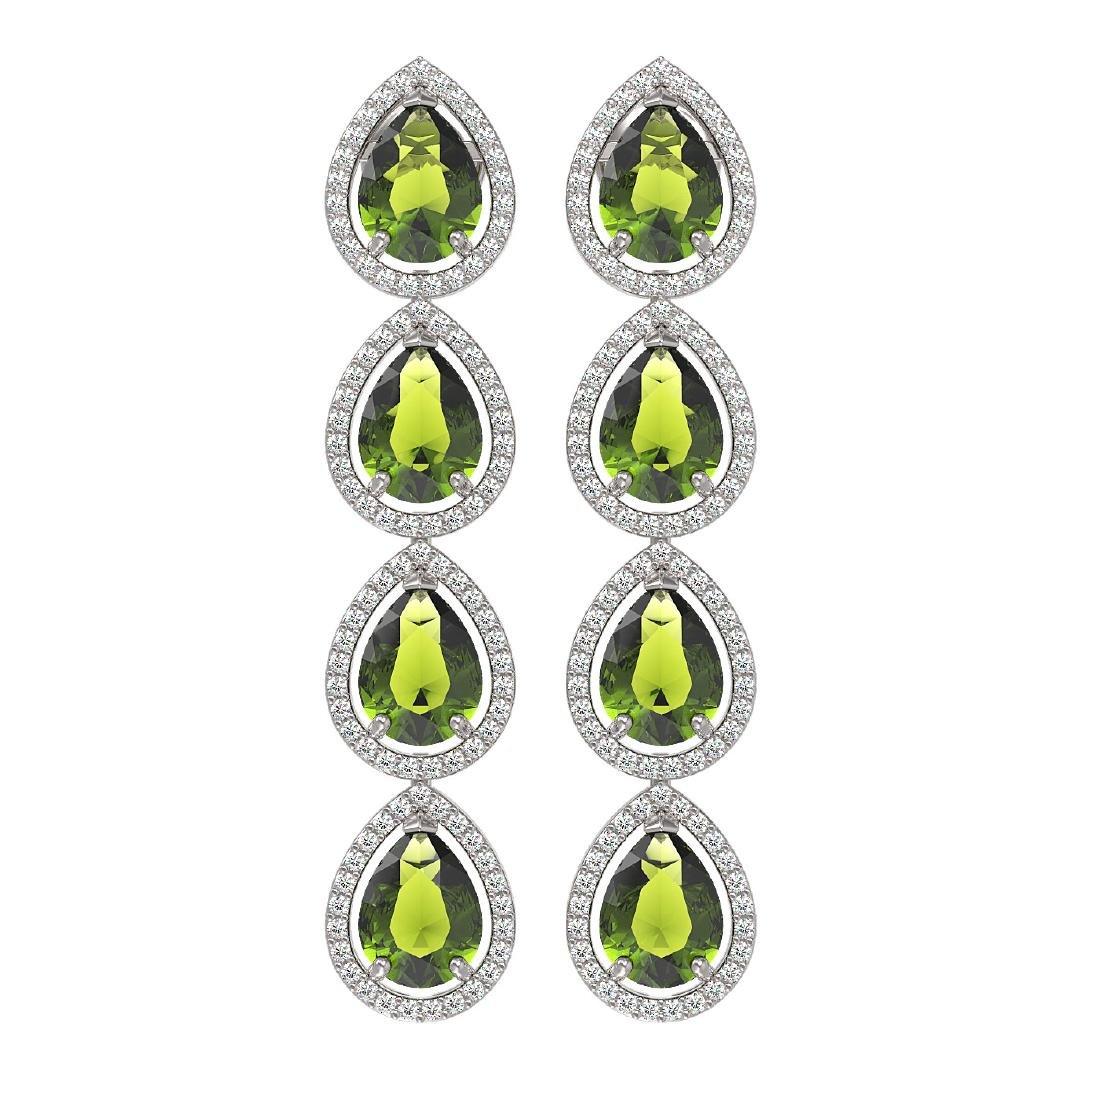 10.48 CTW Tourmaline & Diamond Halo Earrings 10K White